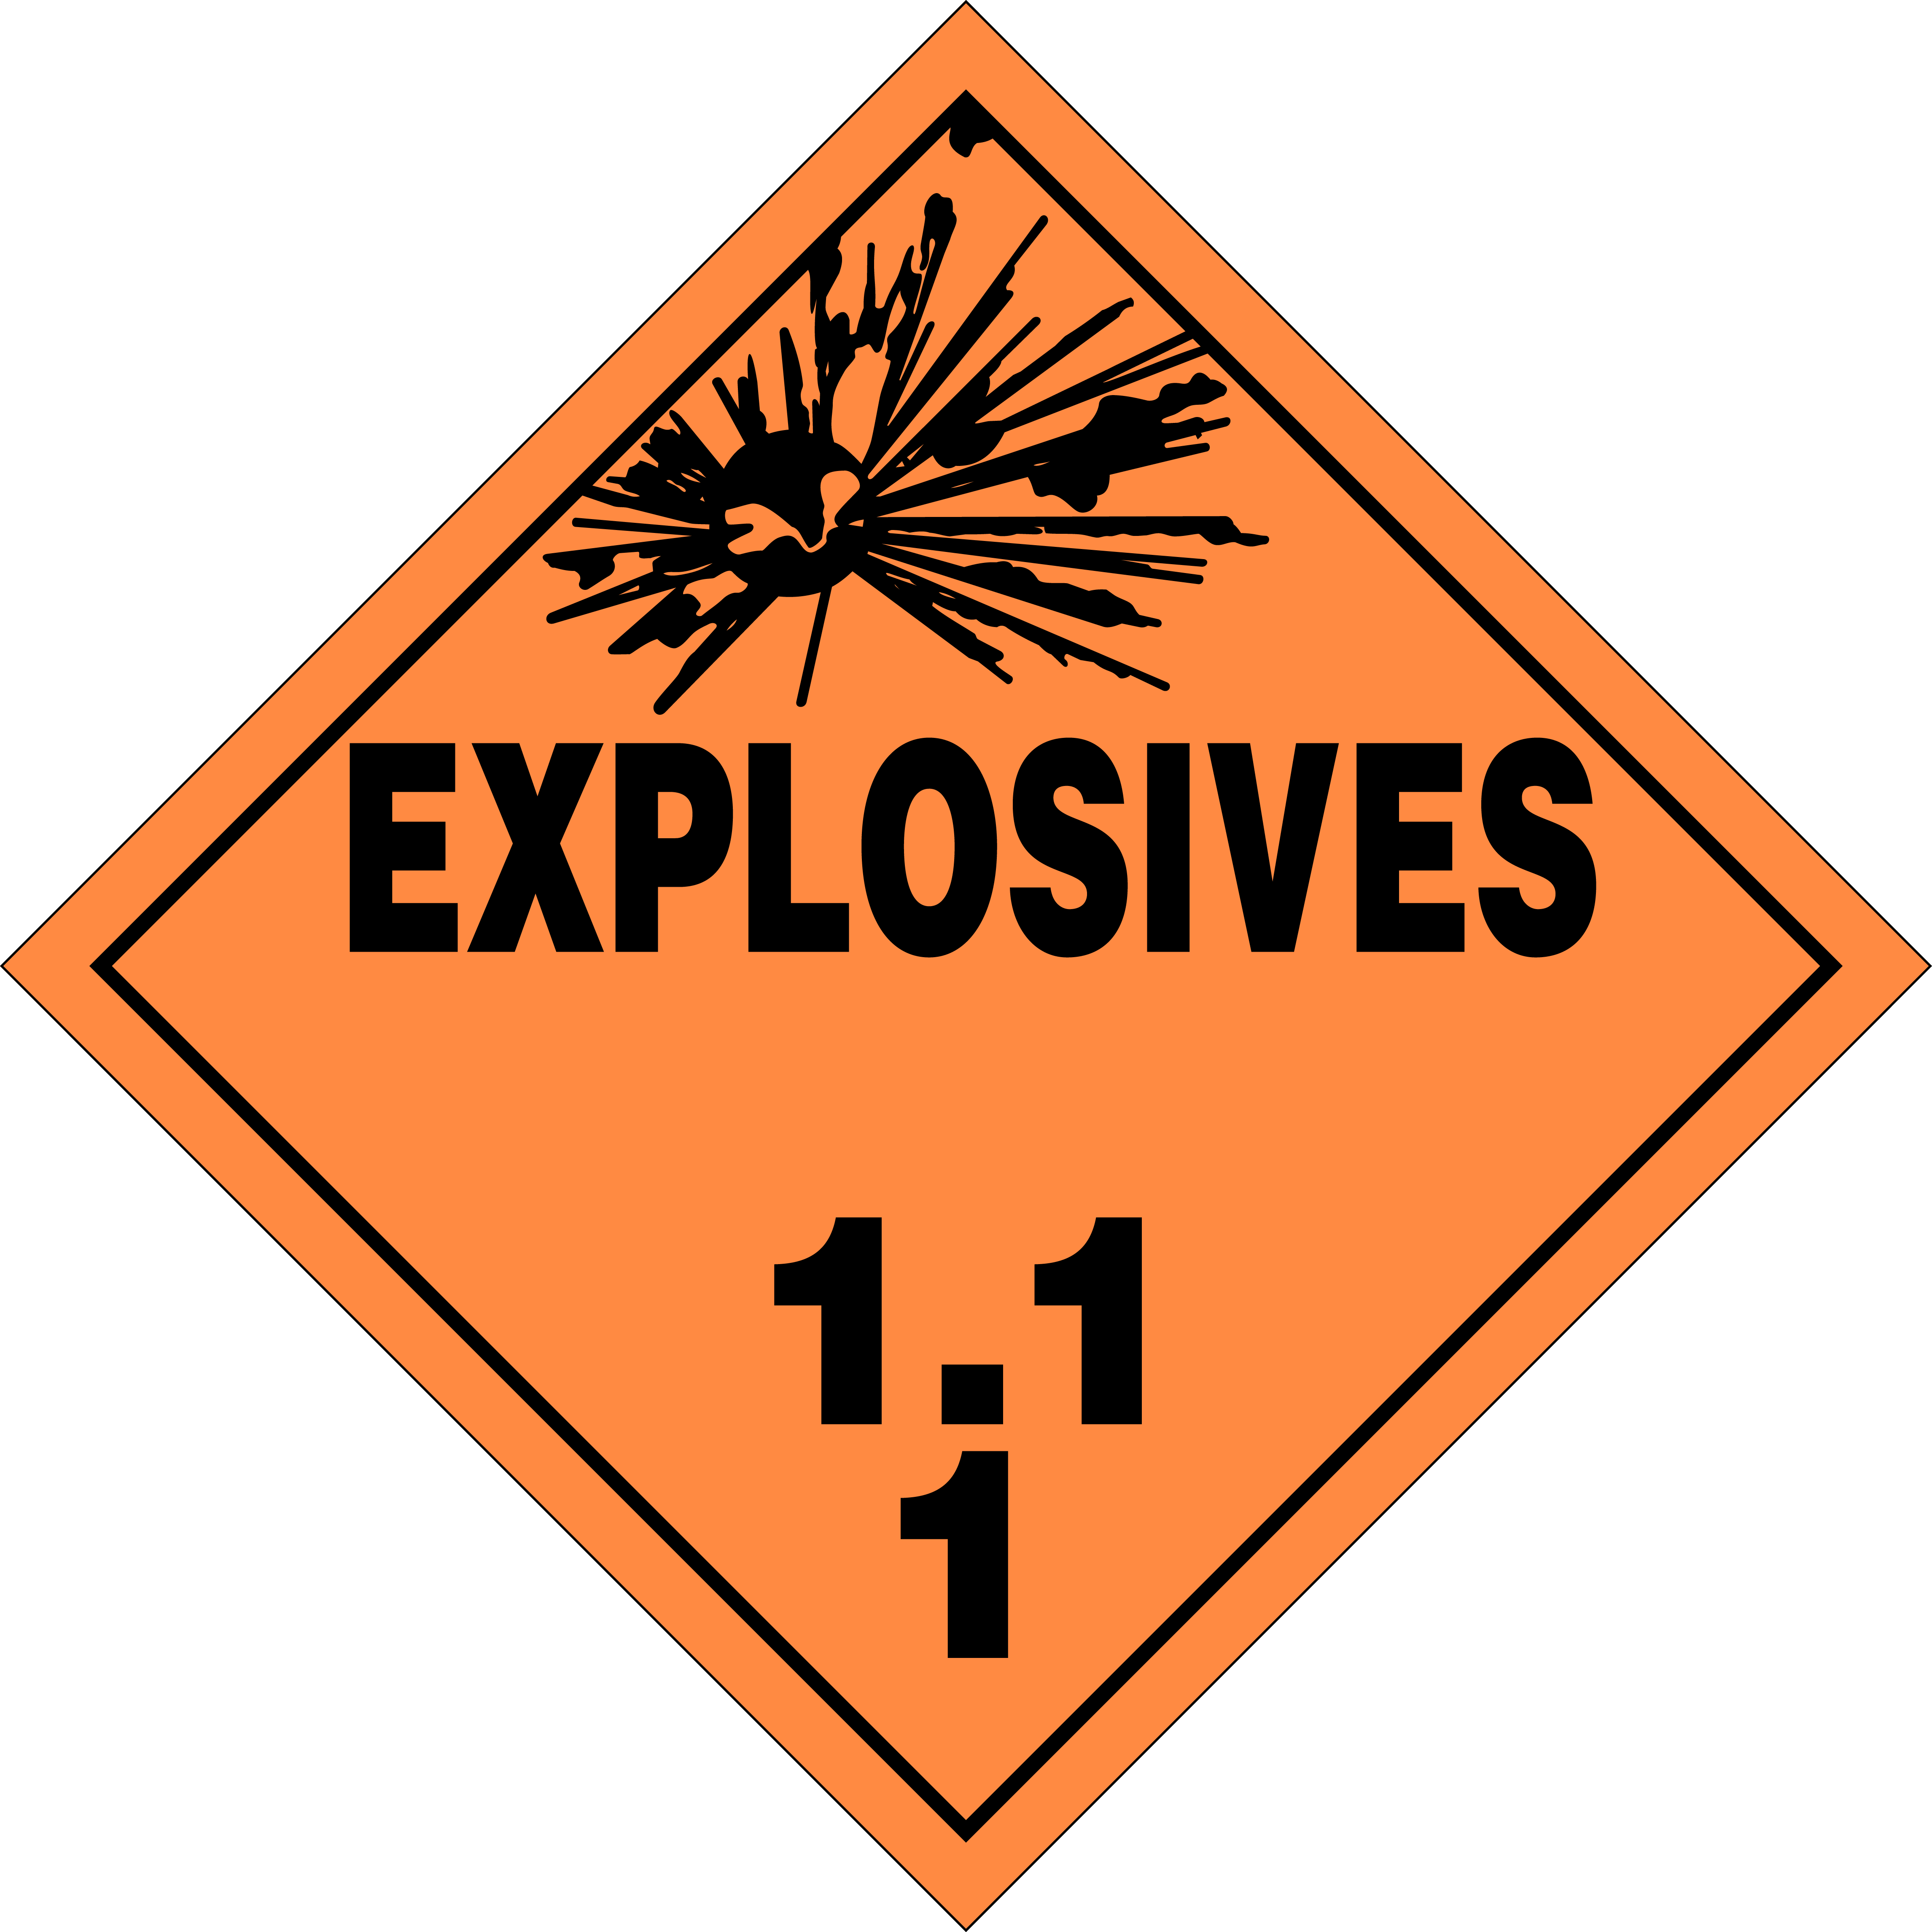 Hazard Symbol Pdf